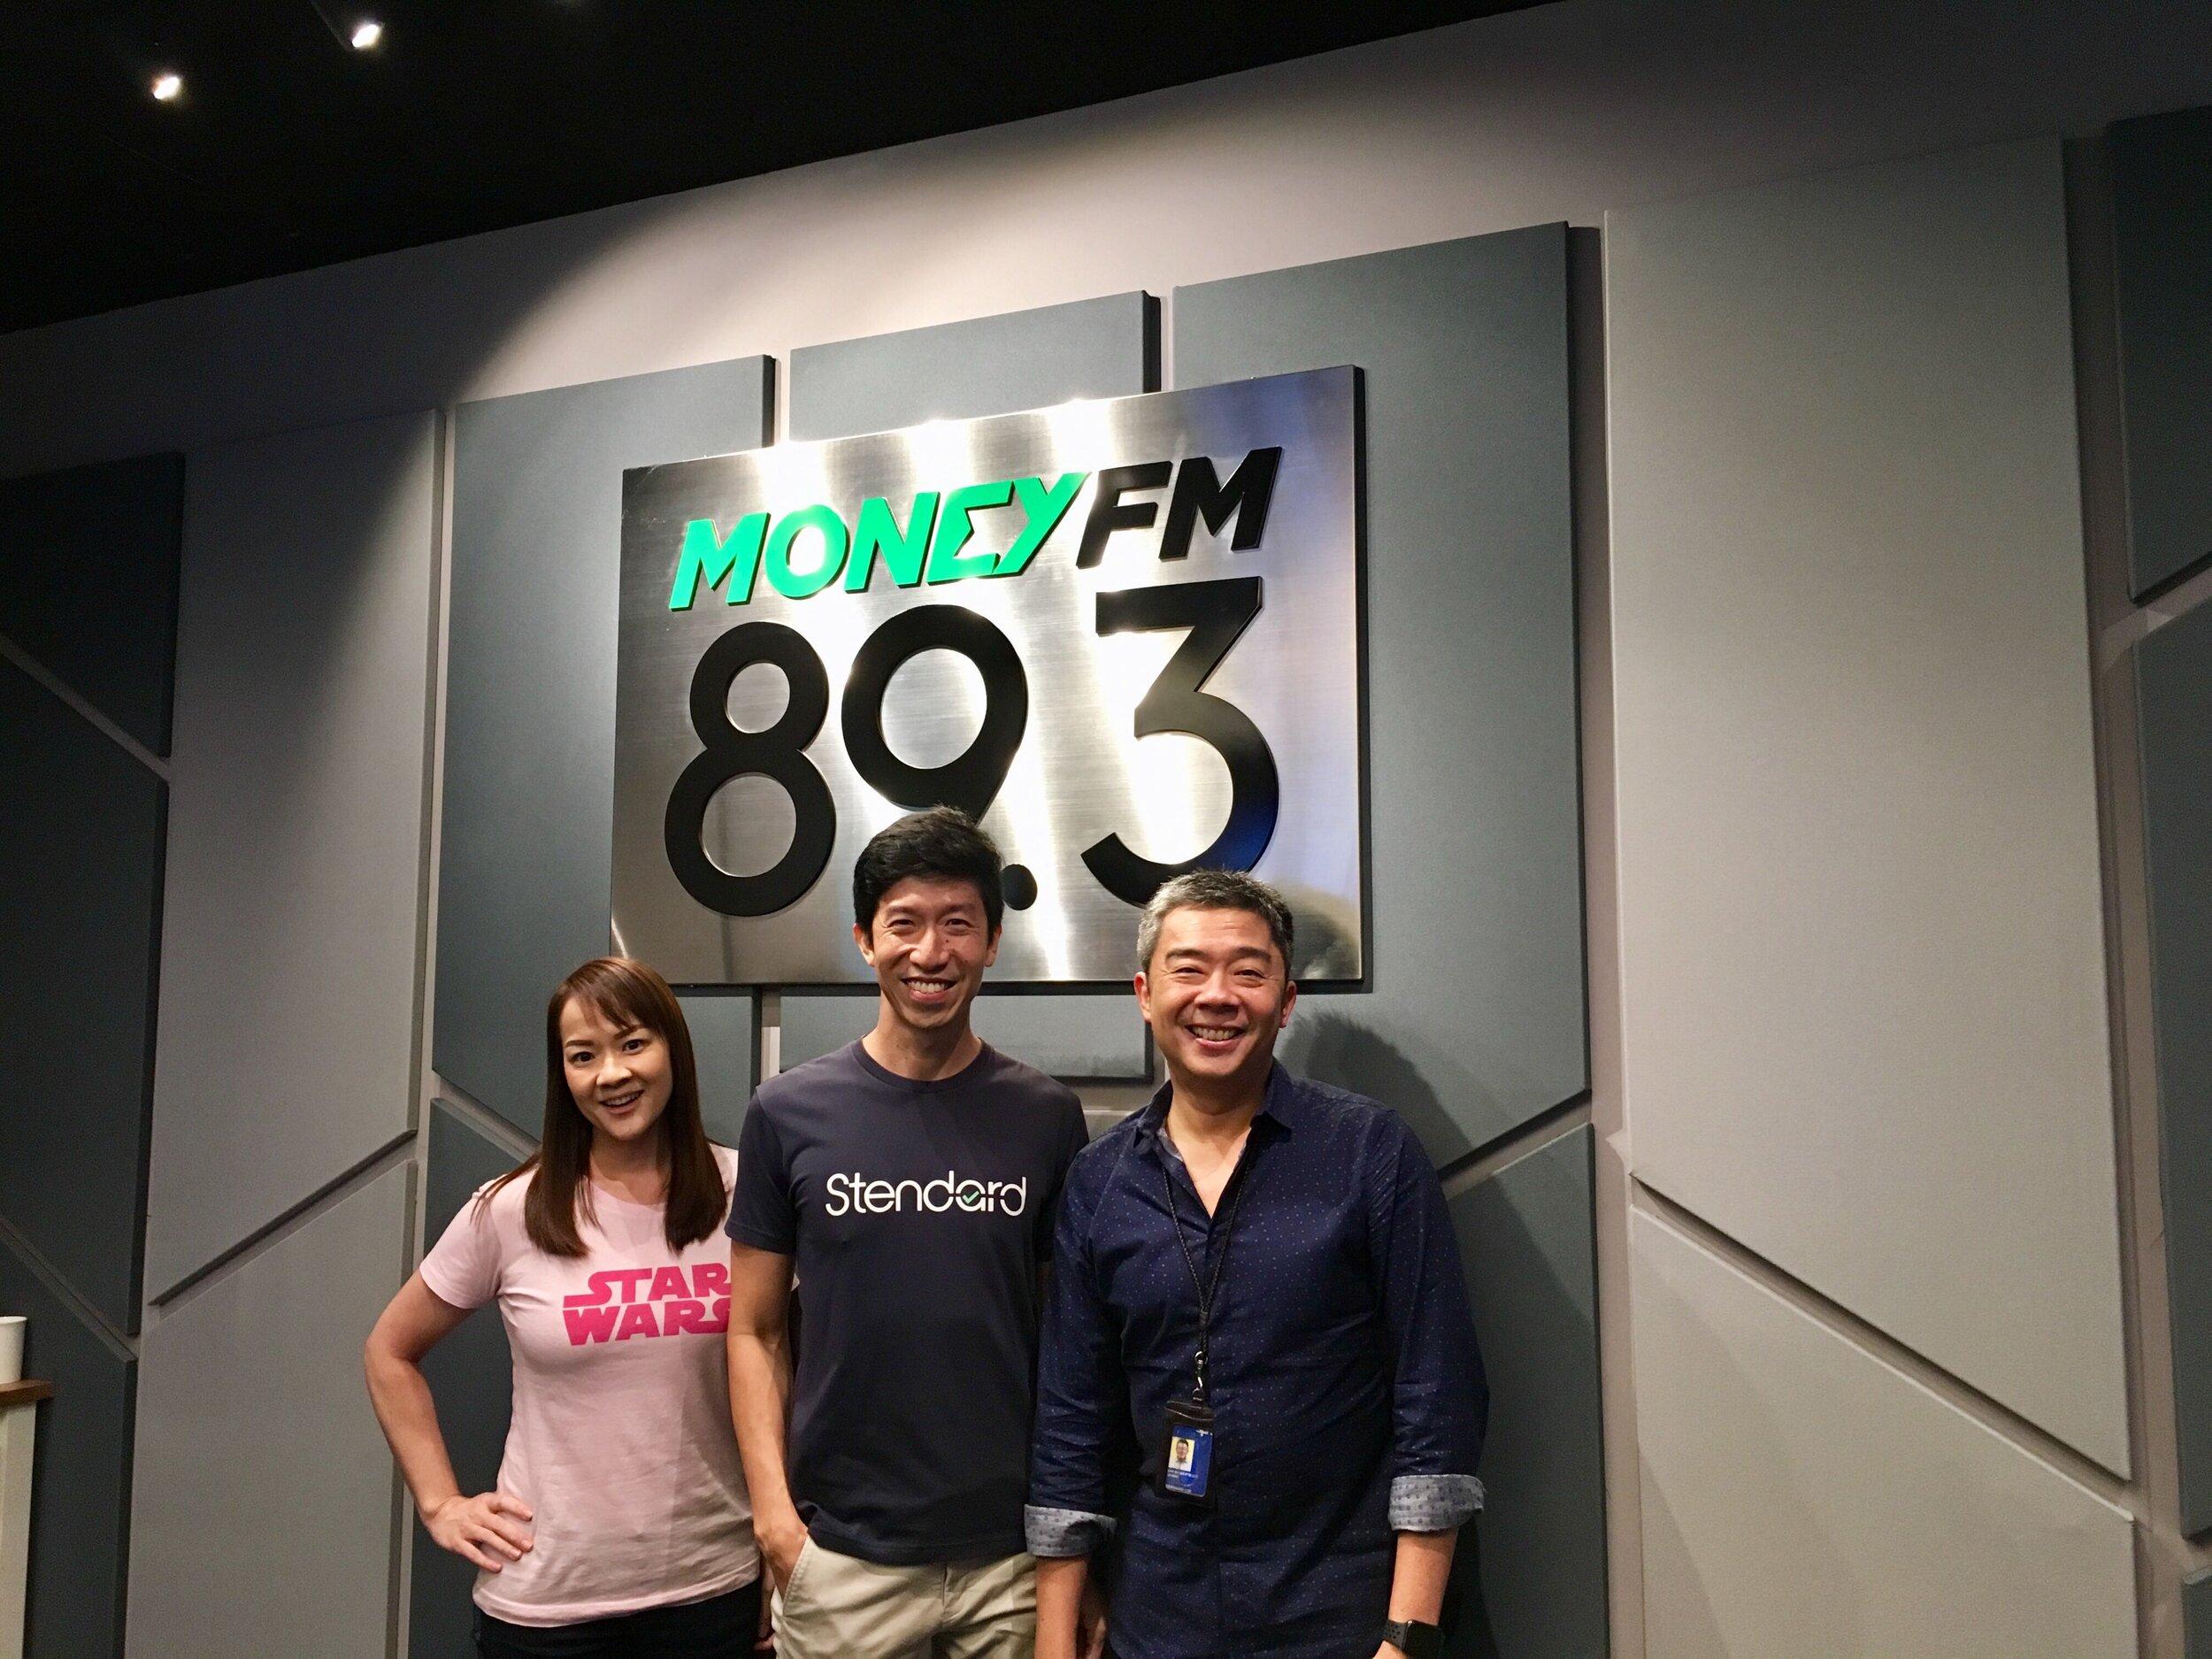 At the MoneyFM 89.3 studio (from left): Howie, Jason, Bernard